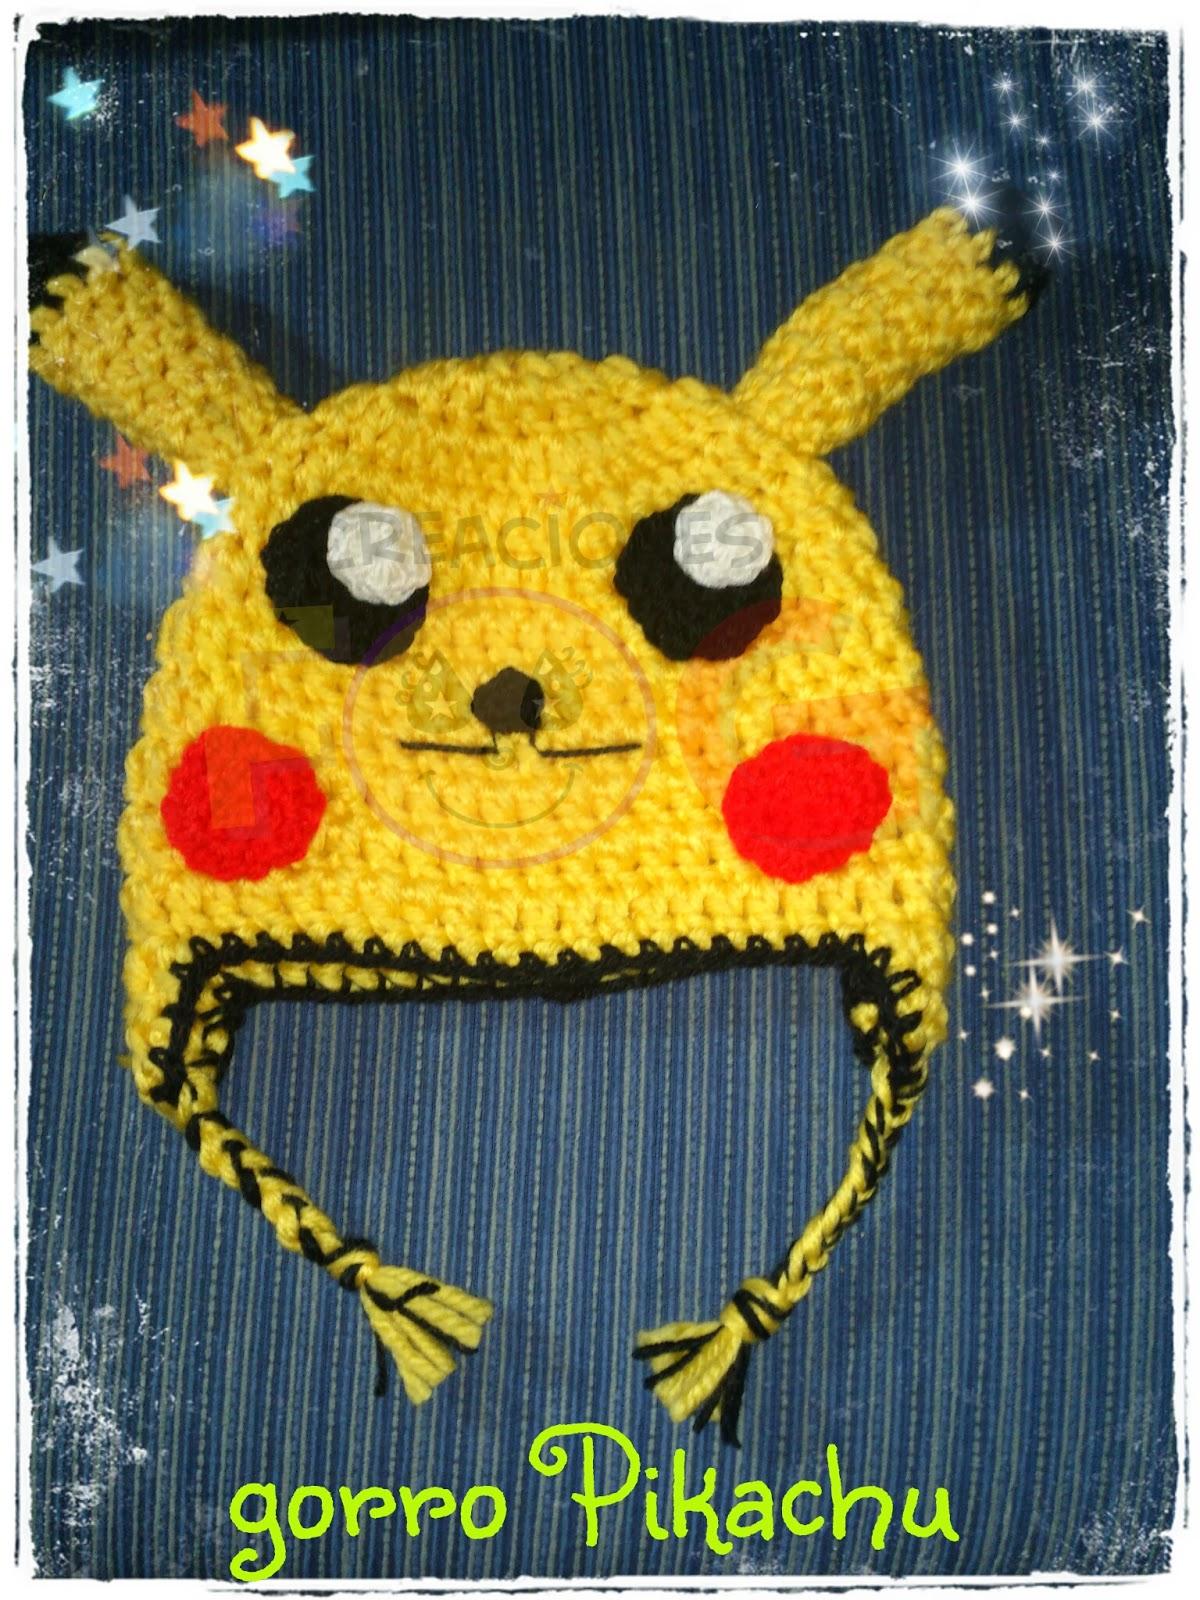 Olguigurumis: Gorro crochet Pikachu